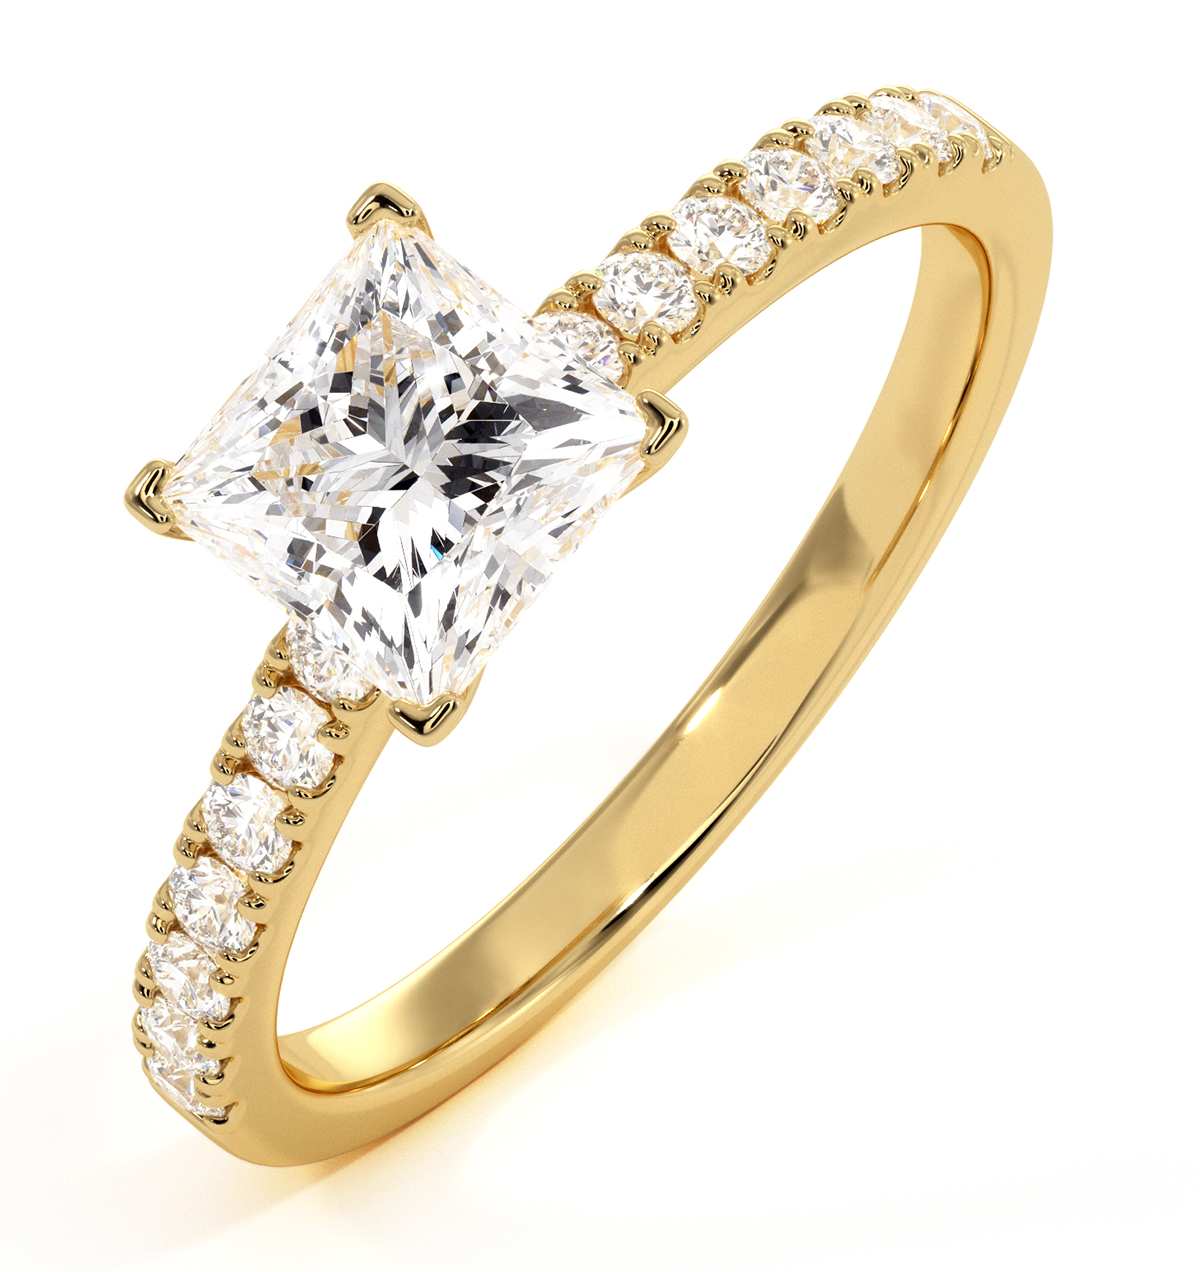 Katerina GIA Princess Diamond Engagement Ring 18K Gold 1.50ct G/SI2 - image 1